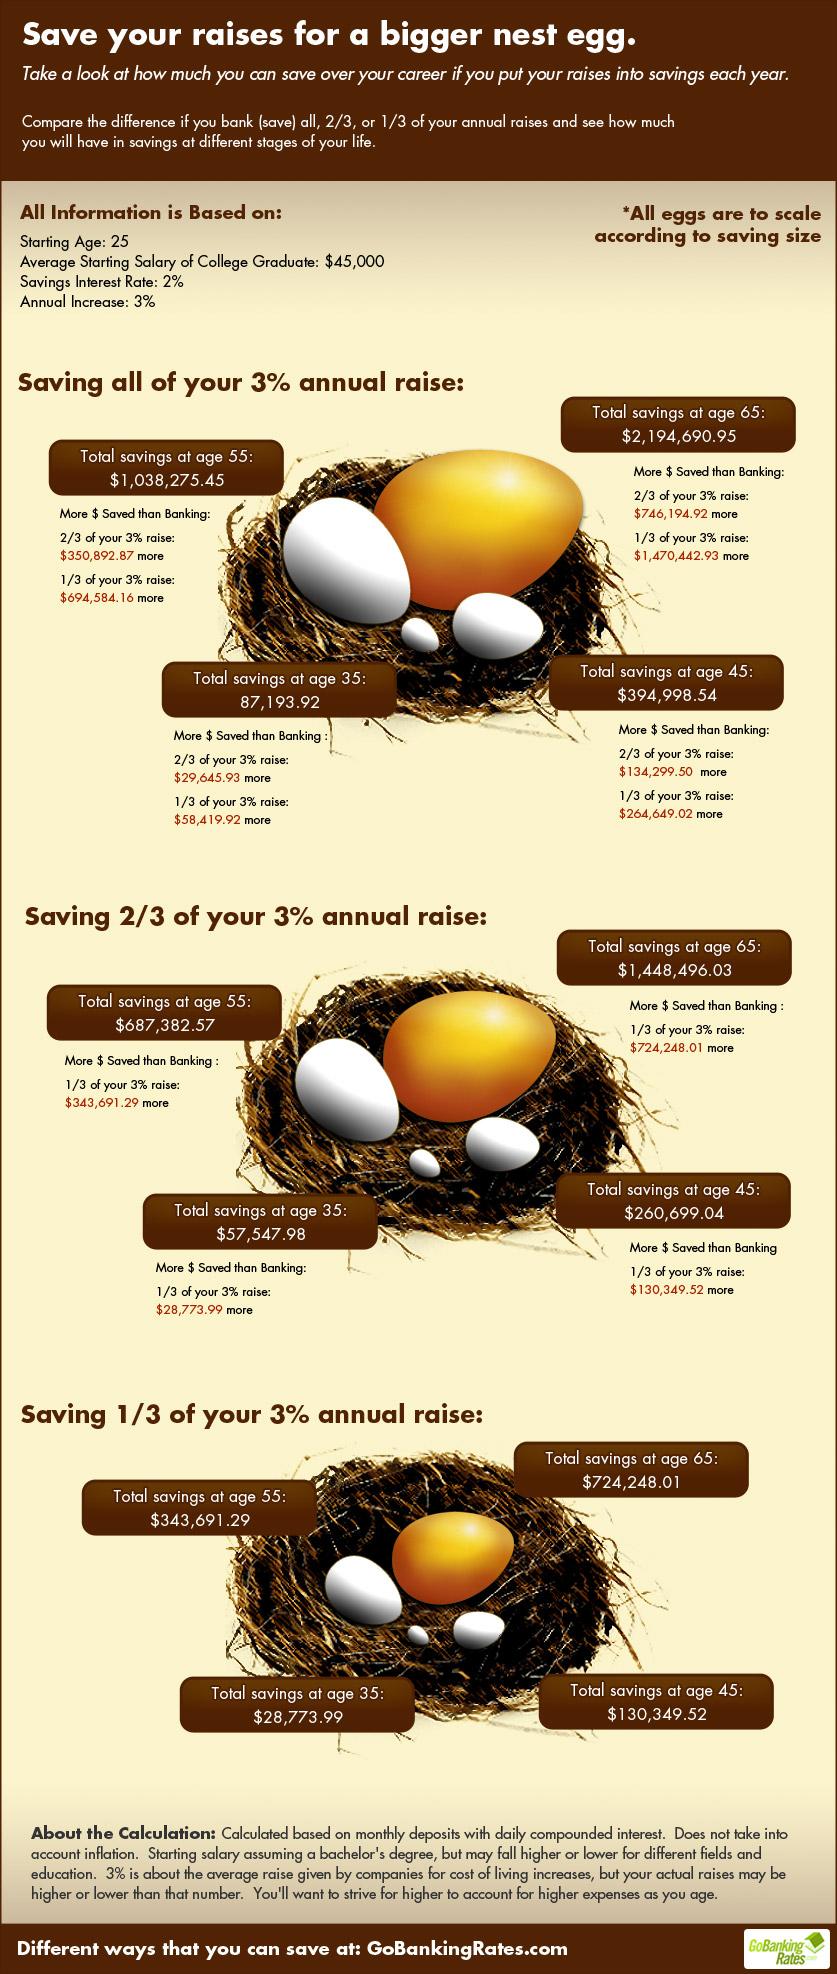 Save Your Raises For A Bigger Nest Egg | GOBankingRates